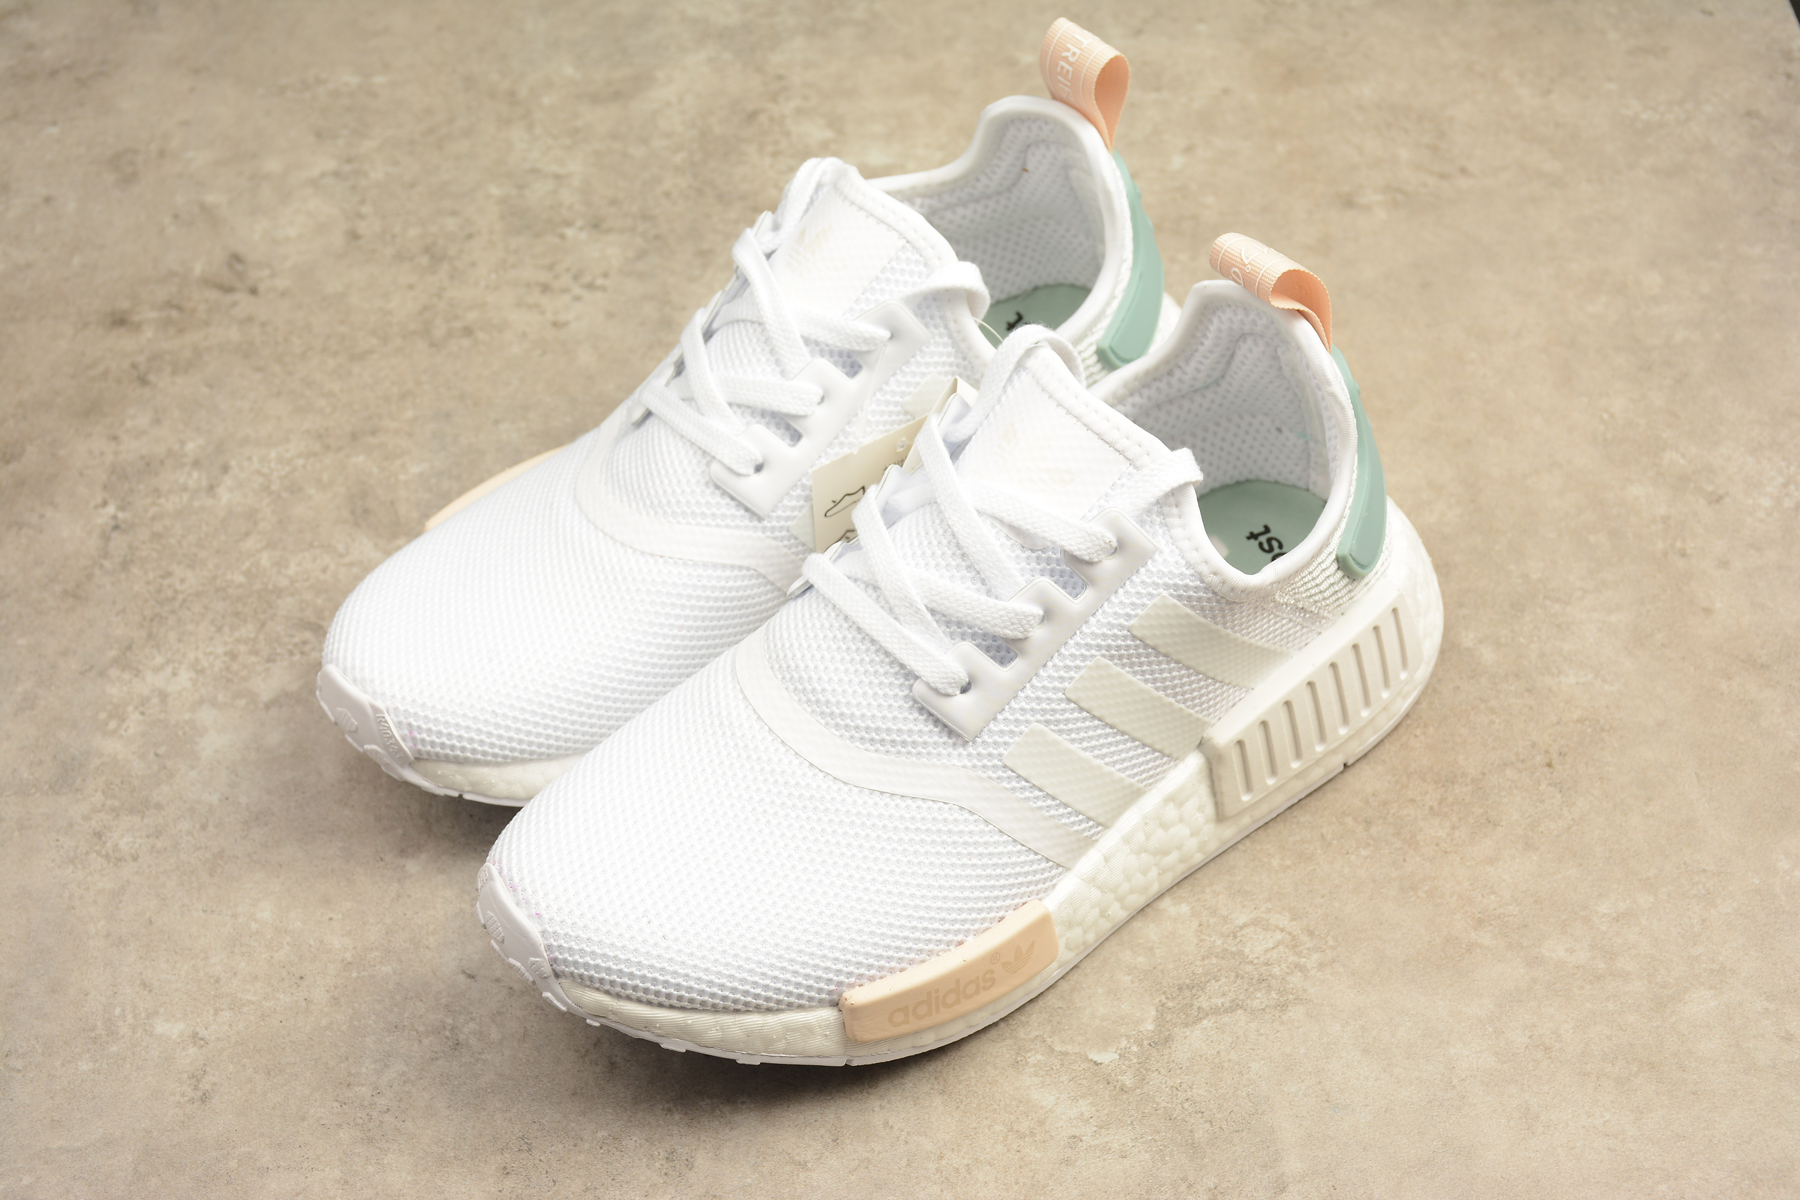 52114dea25cbd ... shopping adidas nmd r1 boost runner white mint orange shoes on storenvy  871ba d6bc6 ...